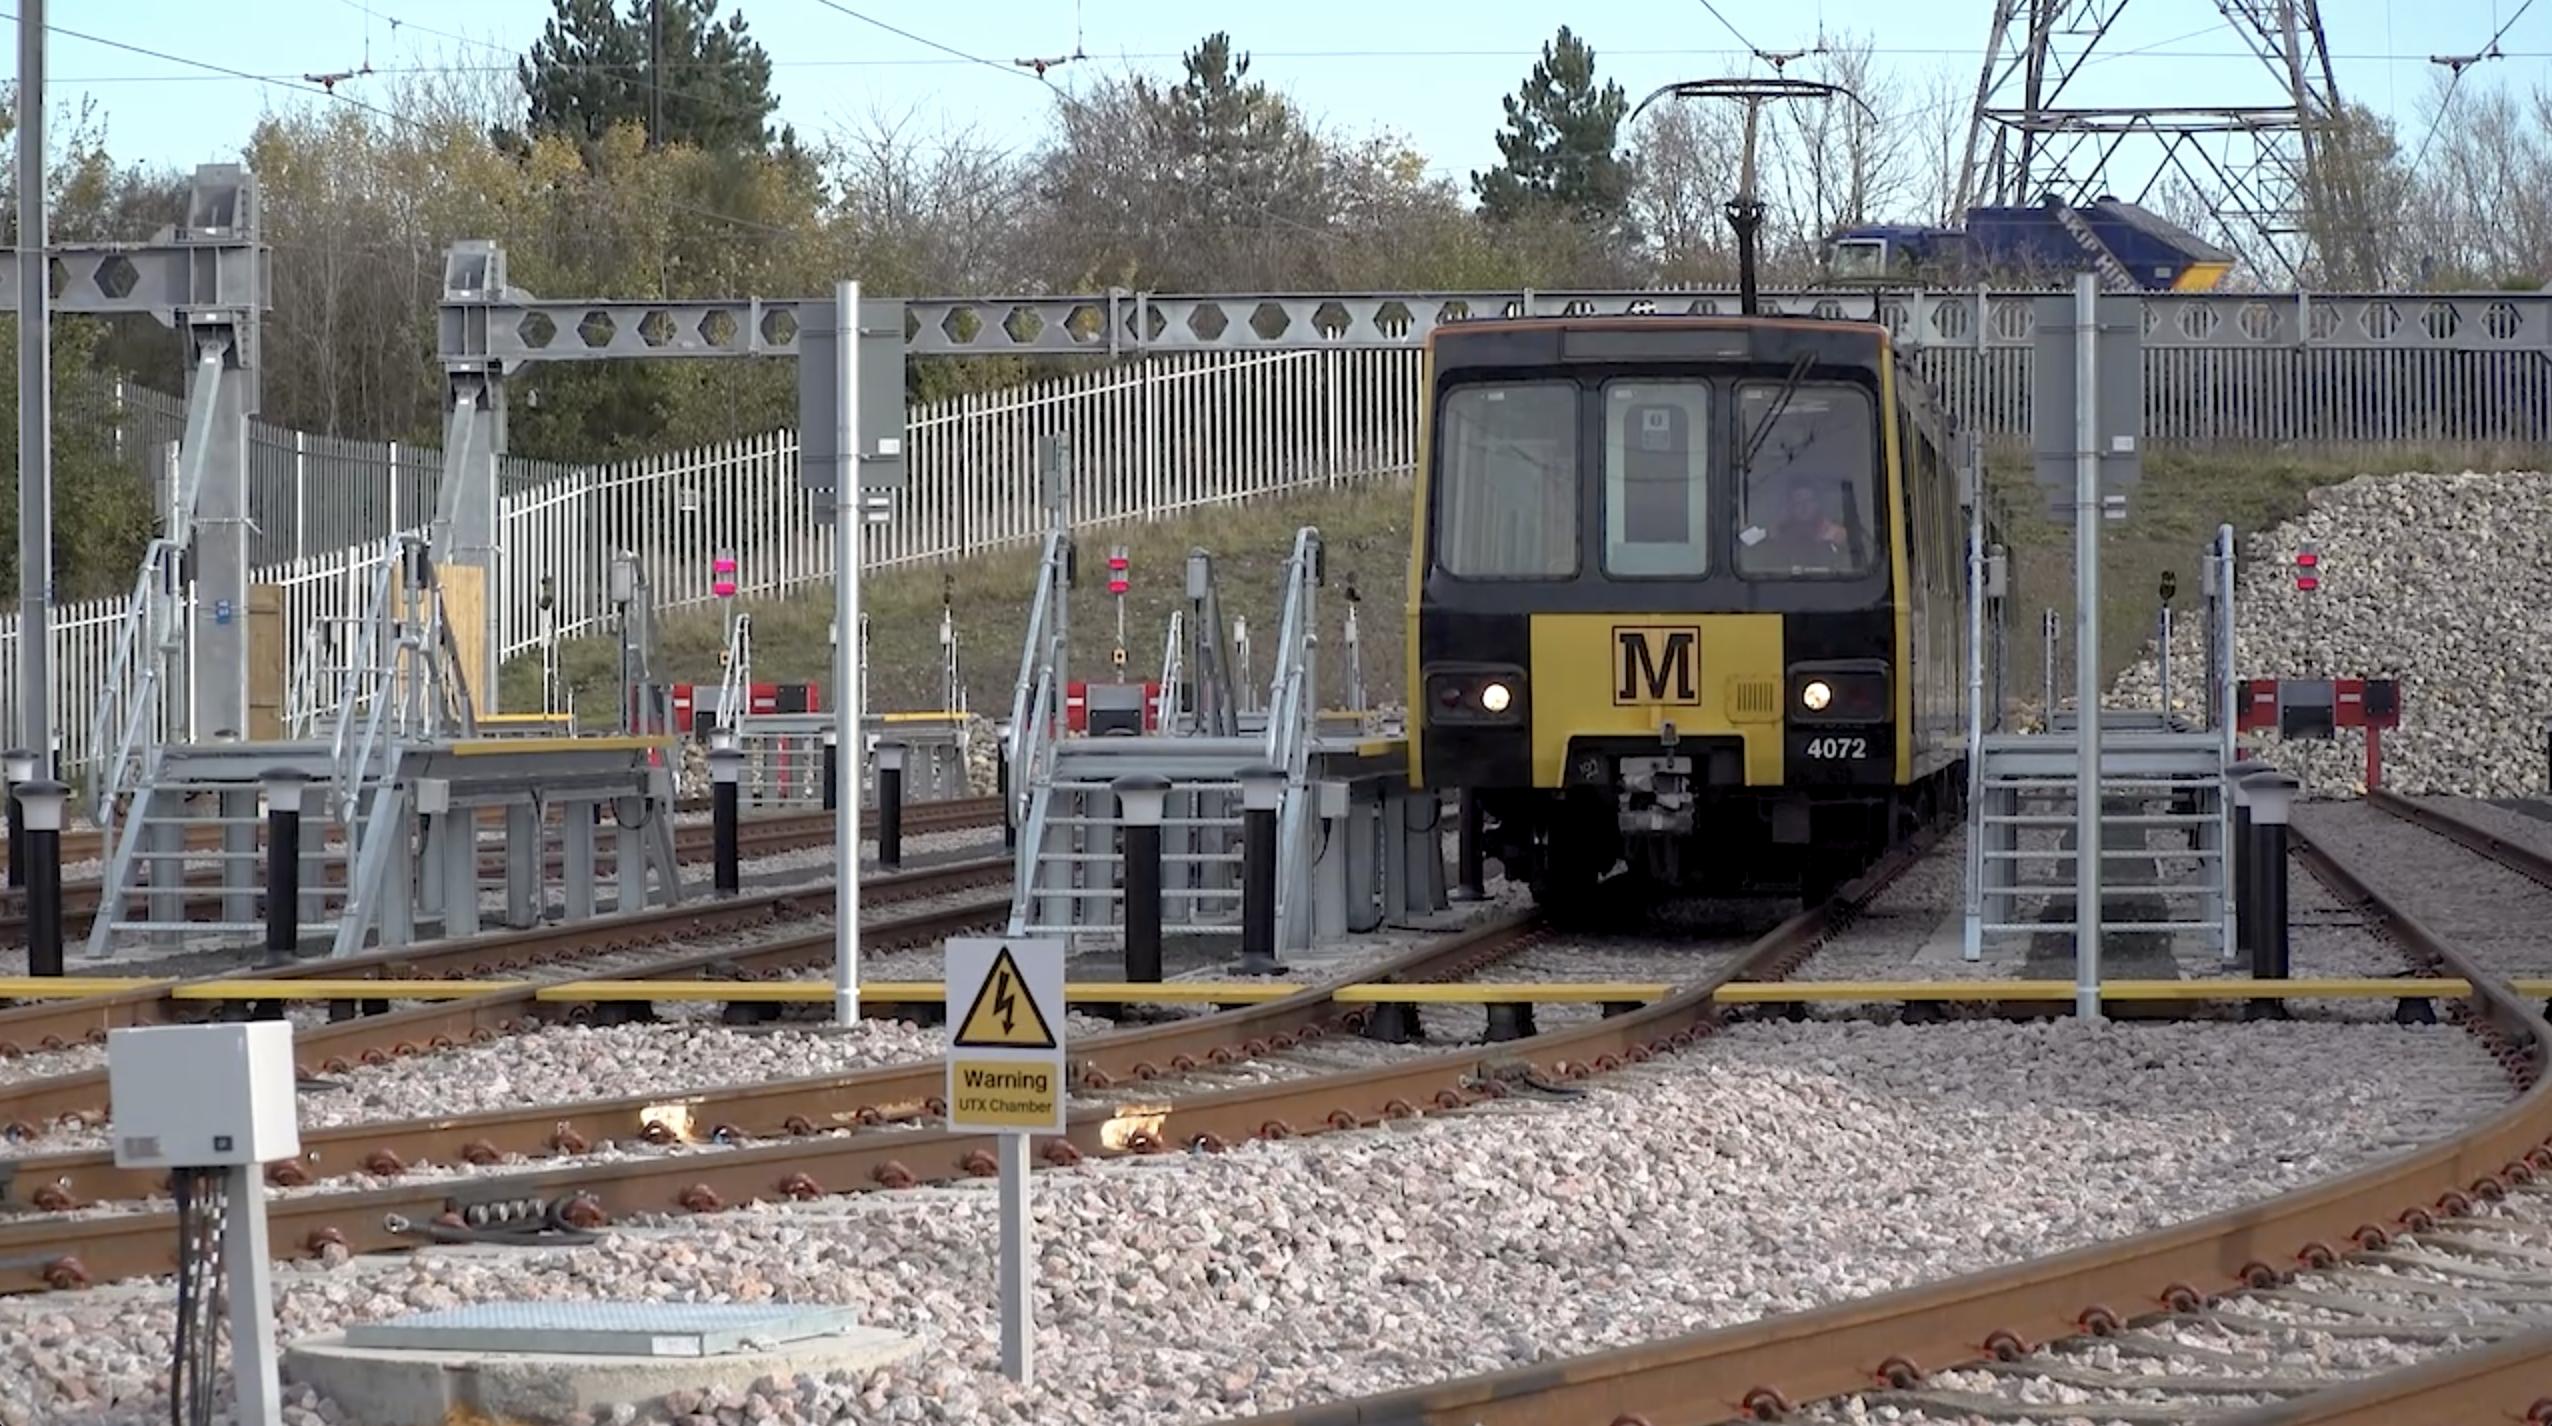 Metro train stabled at Howdon Satellite Depot